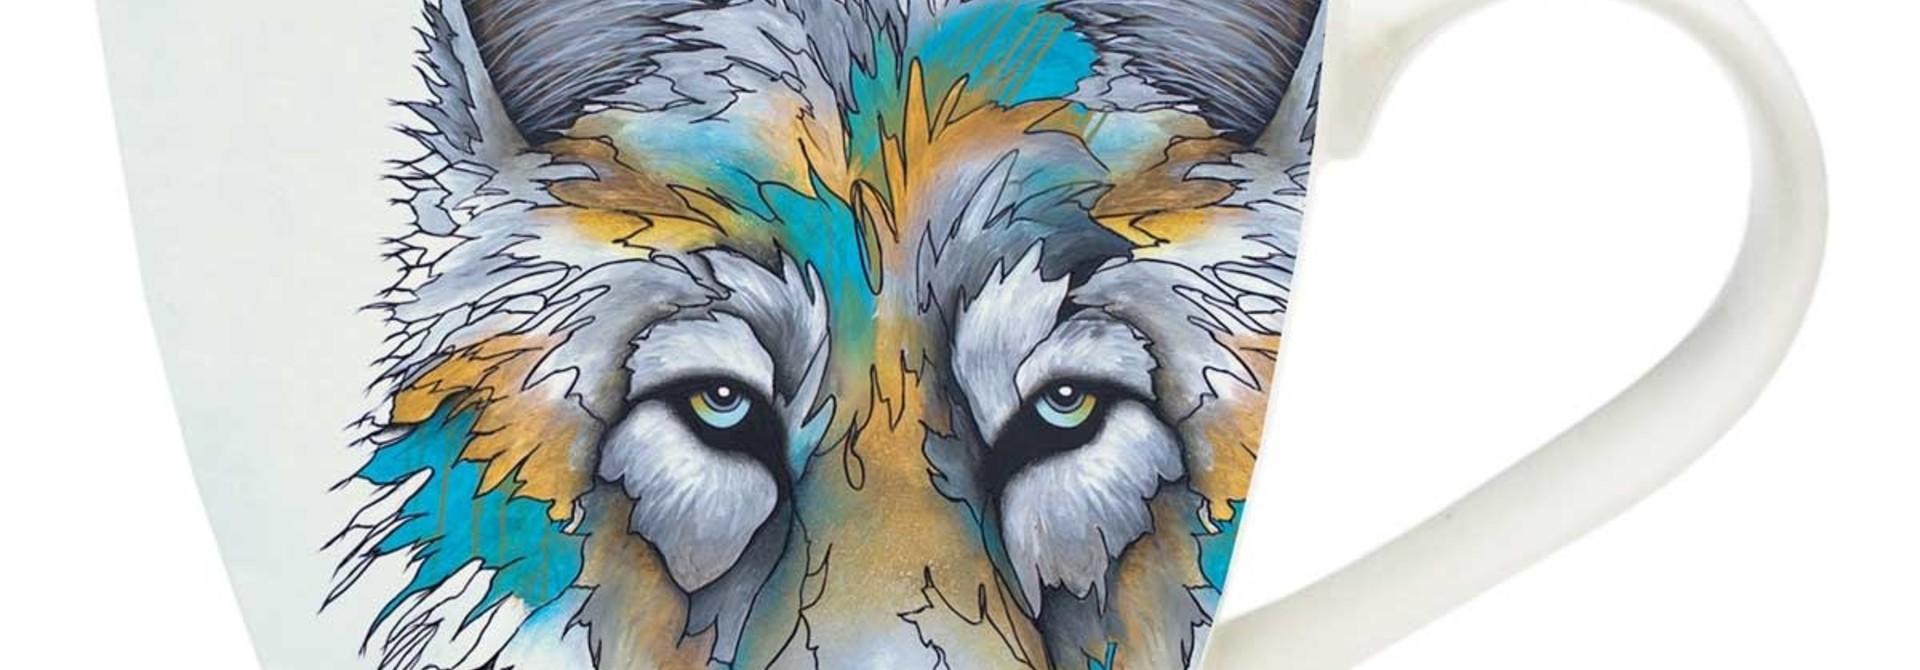 Artists mug - Alpha (Wolf) by Micqalea Jones